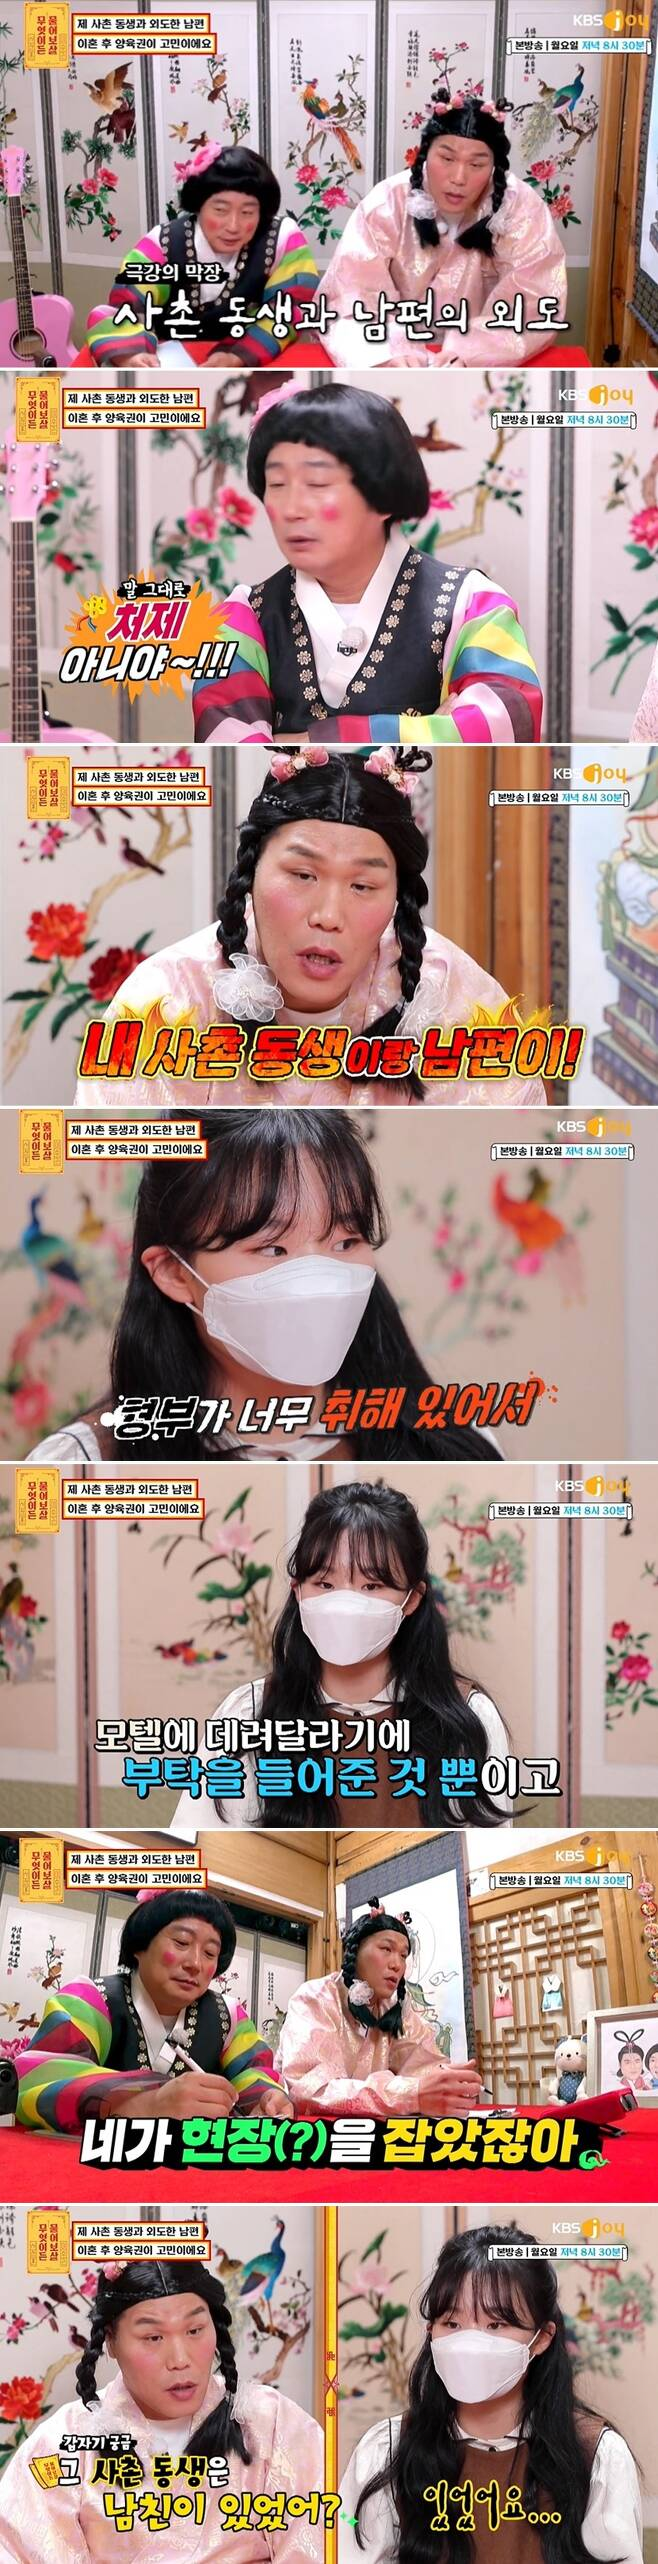 KBS Joy '무엇이든 물어보살' 방송화면 갈무리 © 뉴스1